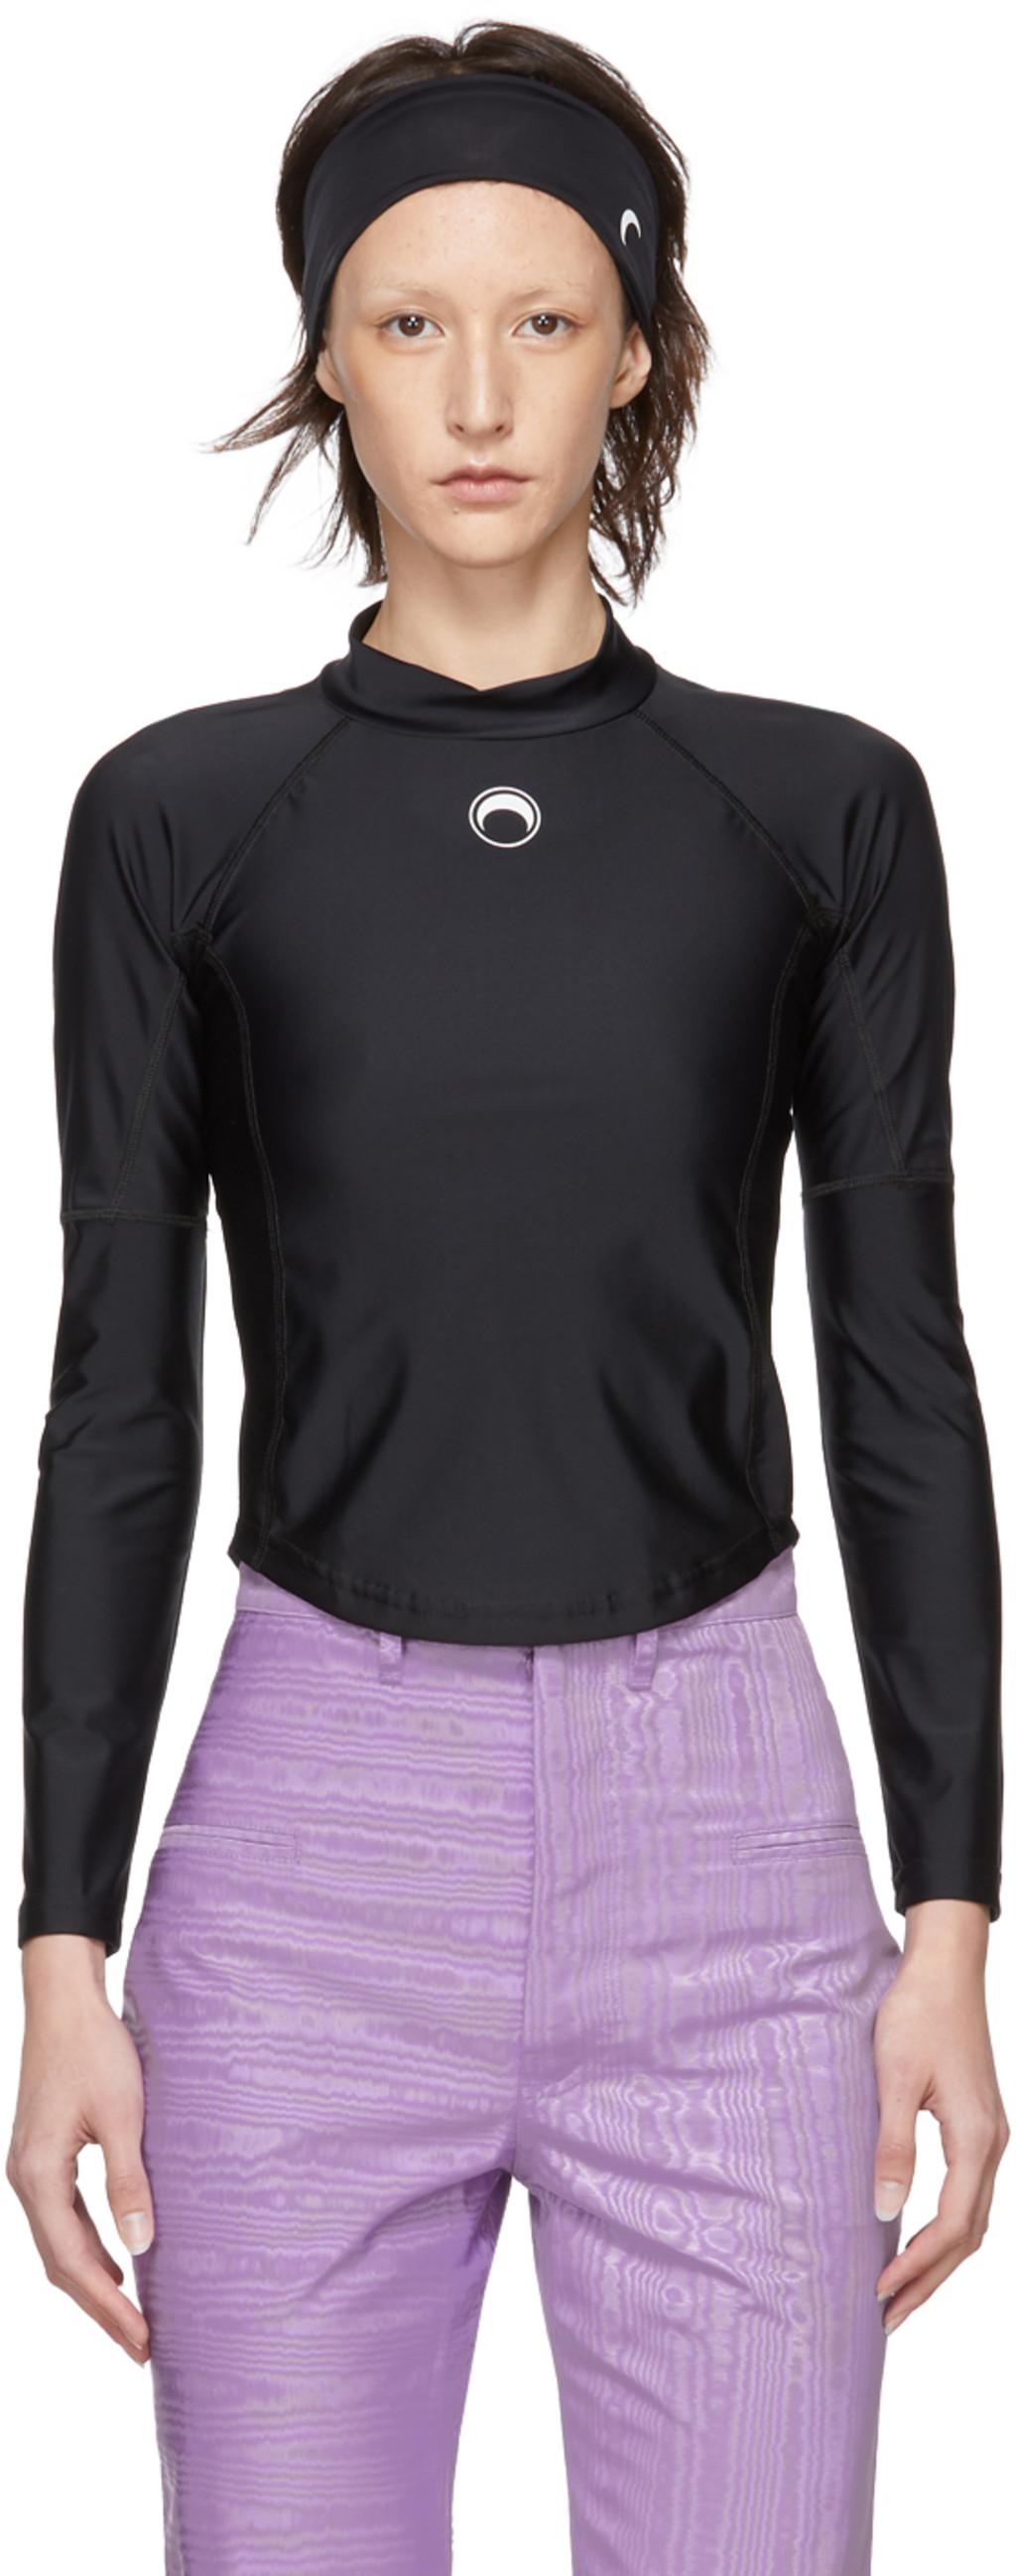 Designer Turtlenecks For Women Ssense Torch Tshirt Blue Black Navy M